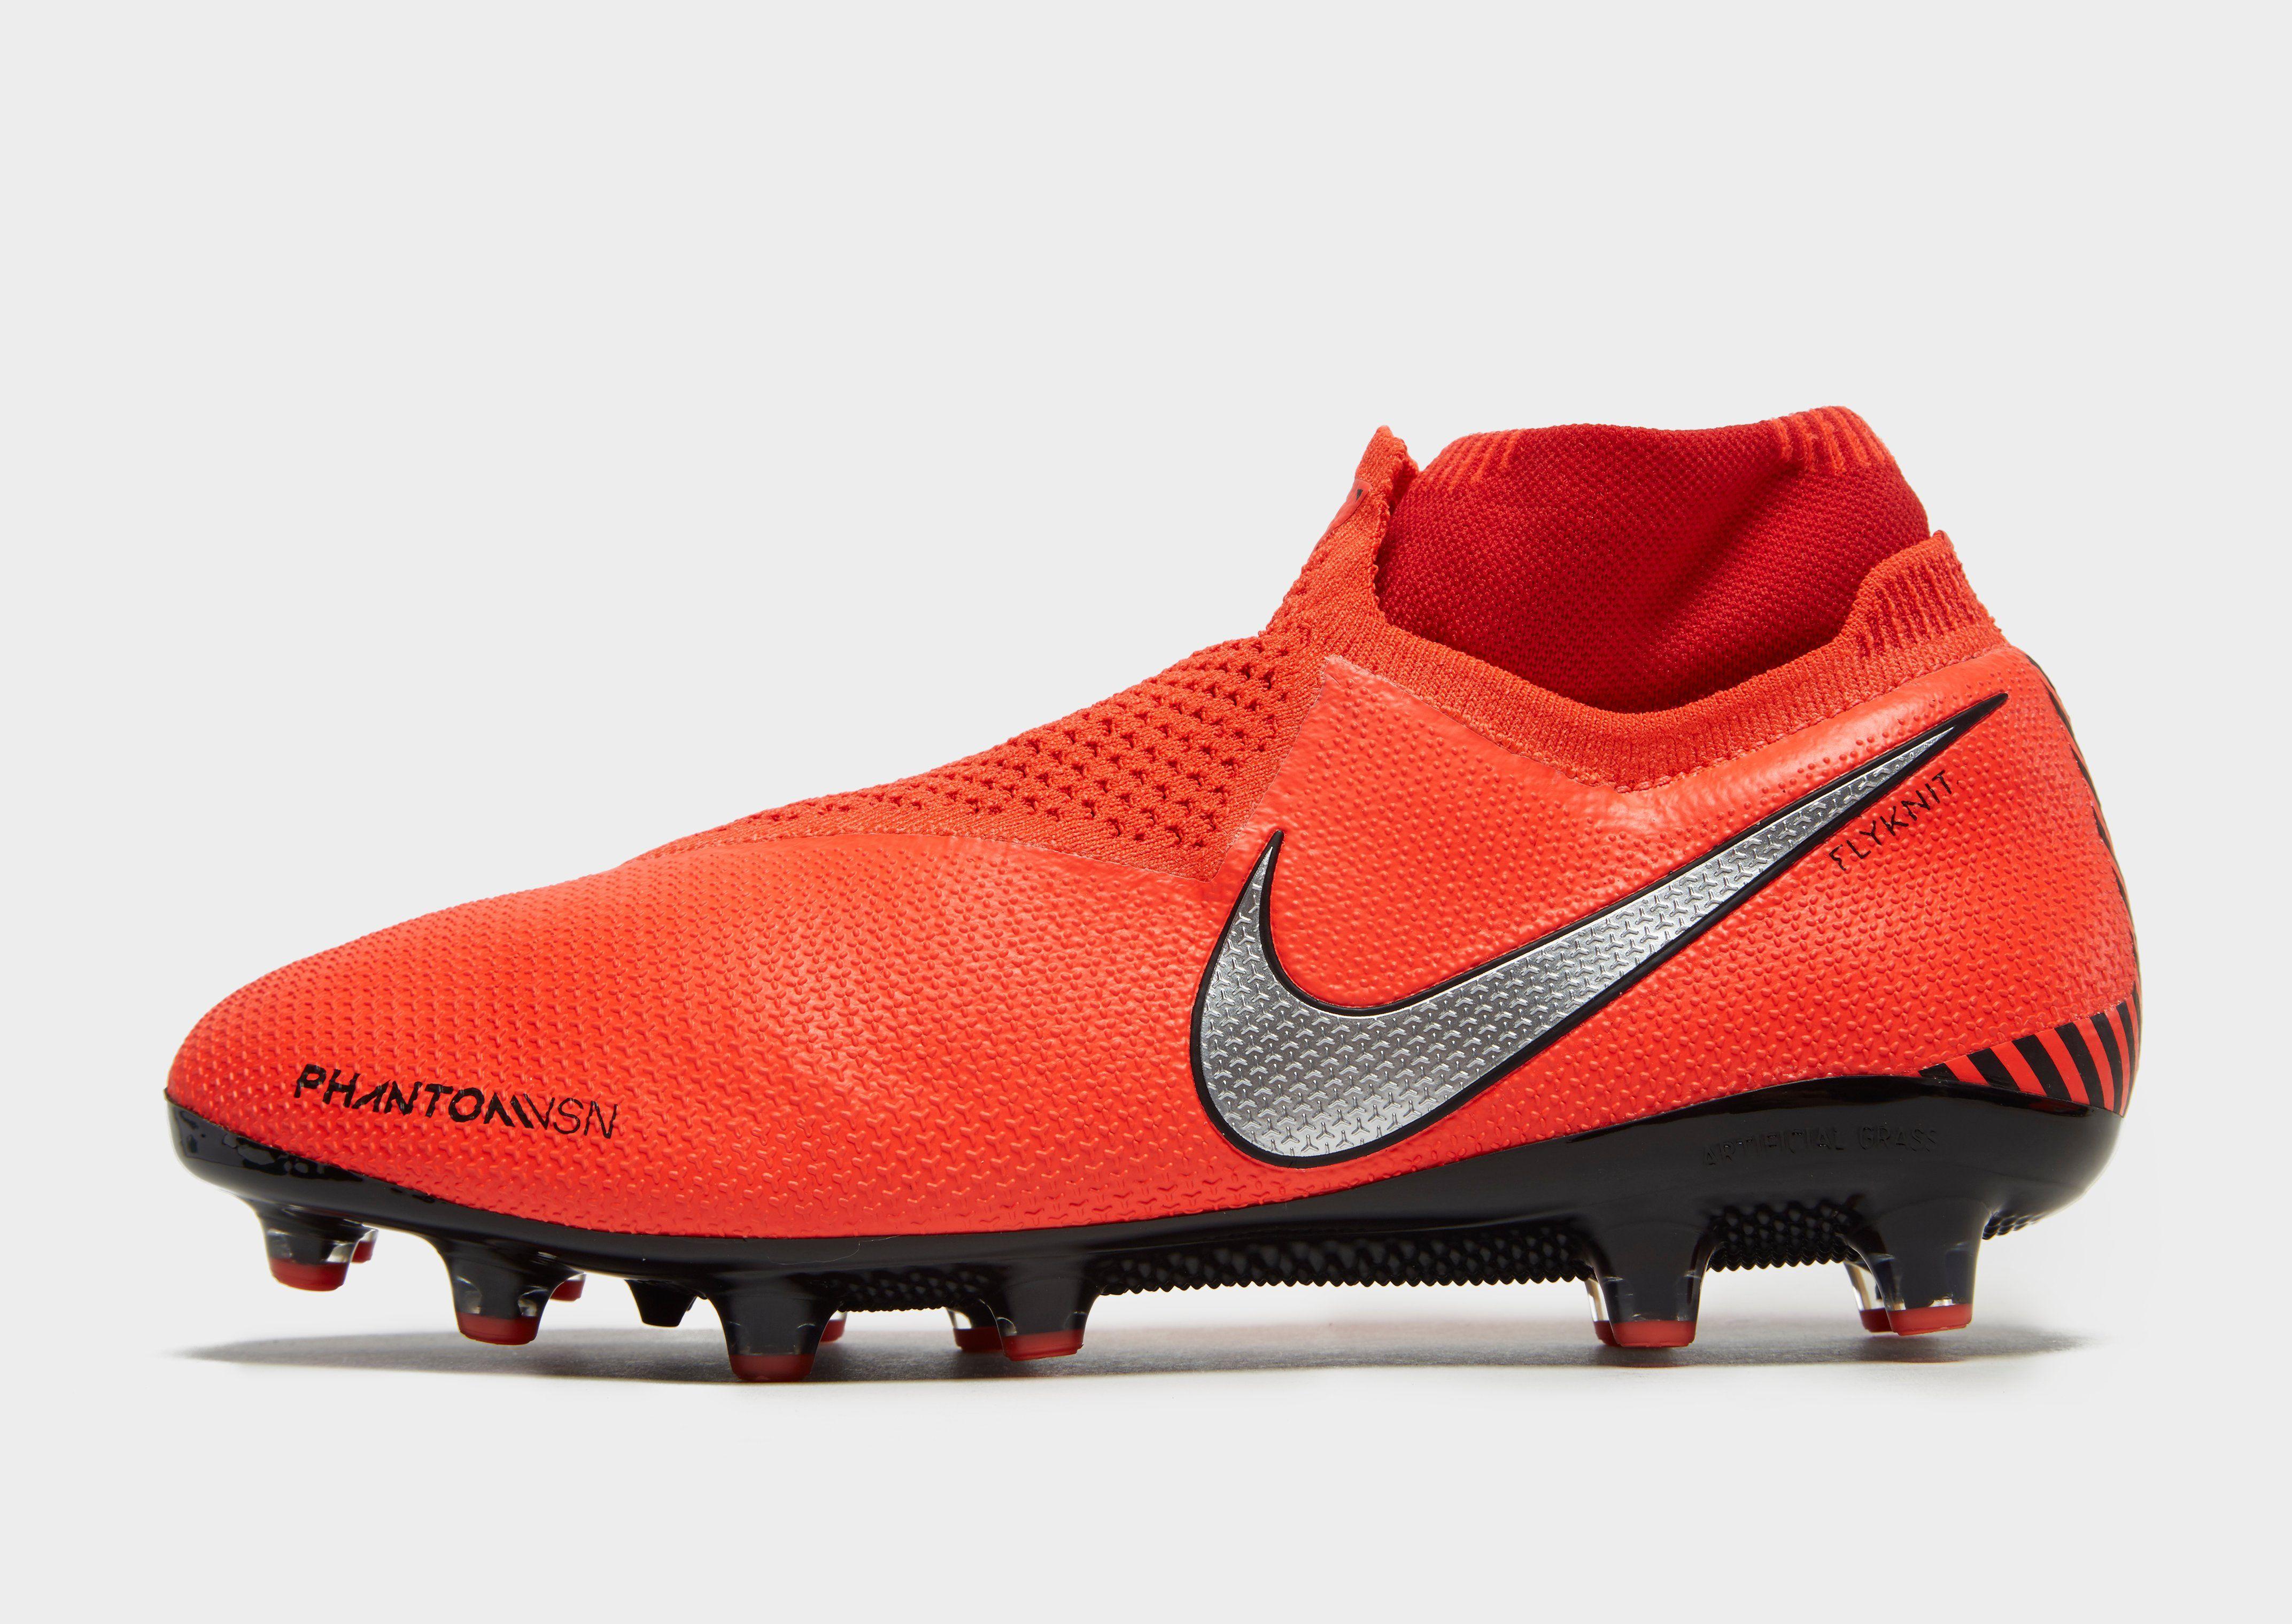 2d185a07ad94 NIKE Nike Phantom Vision Elite Dynamic Fit FG Firm-Ground Football Boot